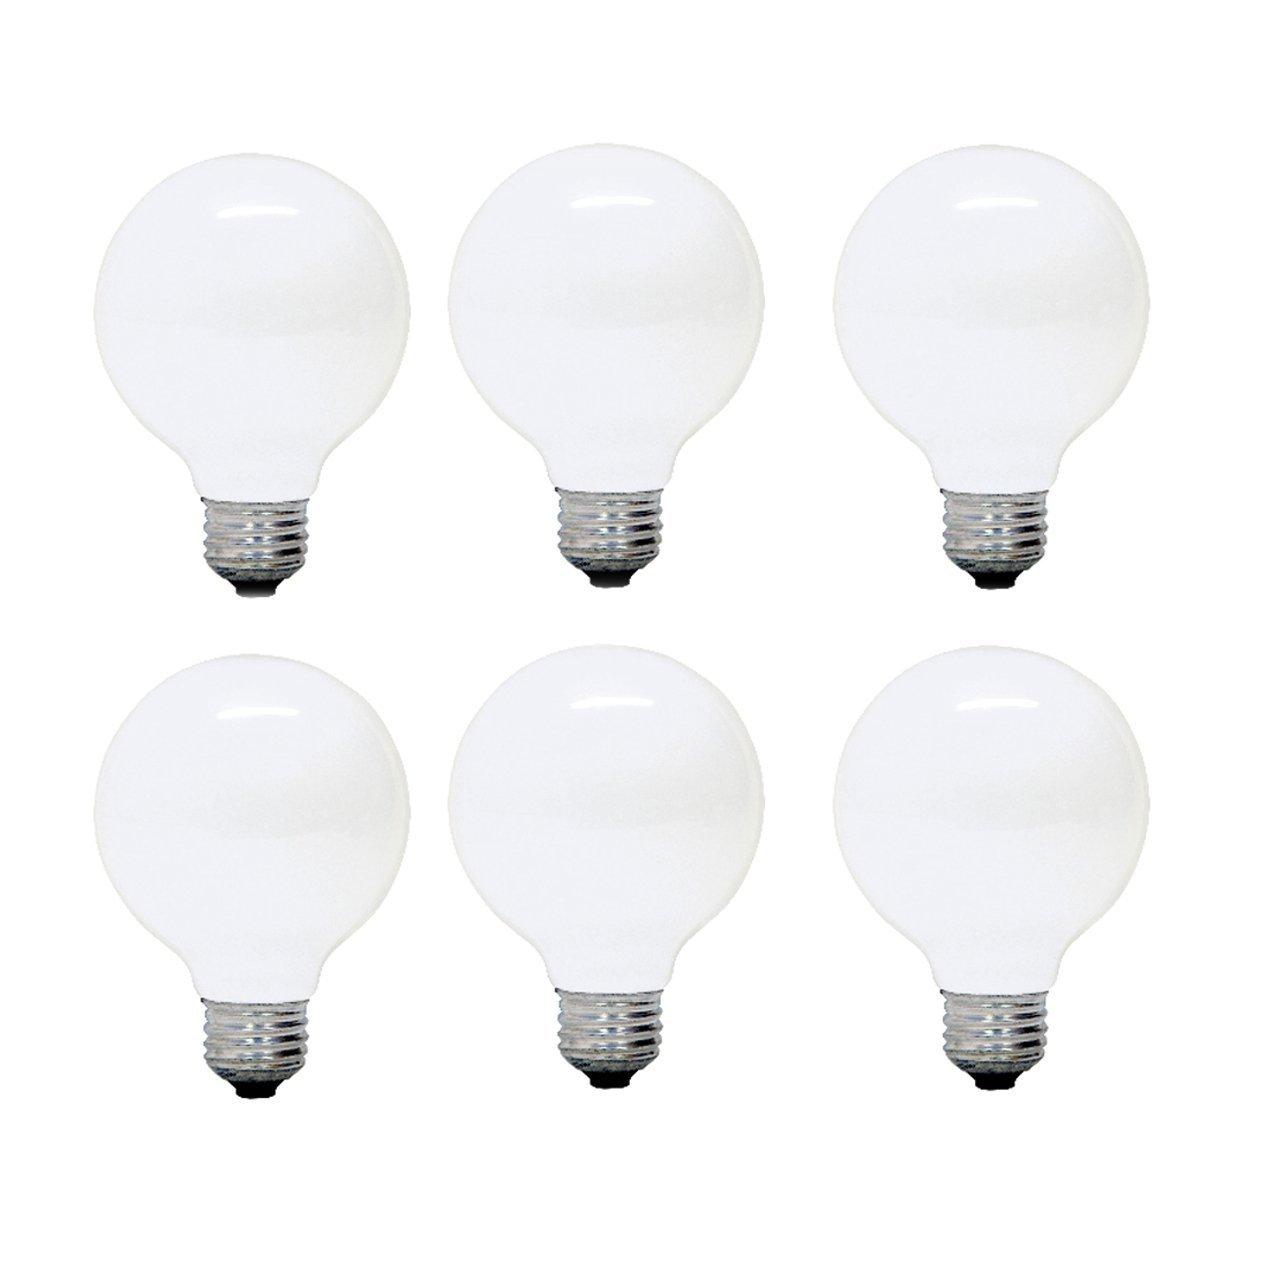 GE Lighting 12982 Not Not Available G25 Incandescent Soft White Globe Light Bulb, 25-Watt, 6-Pack, Frosted,